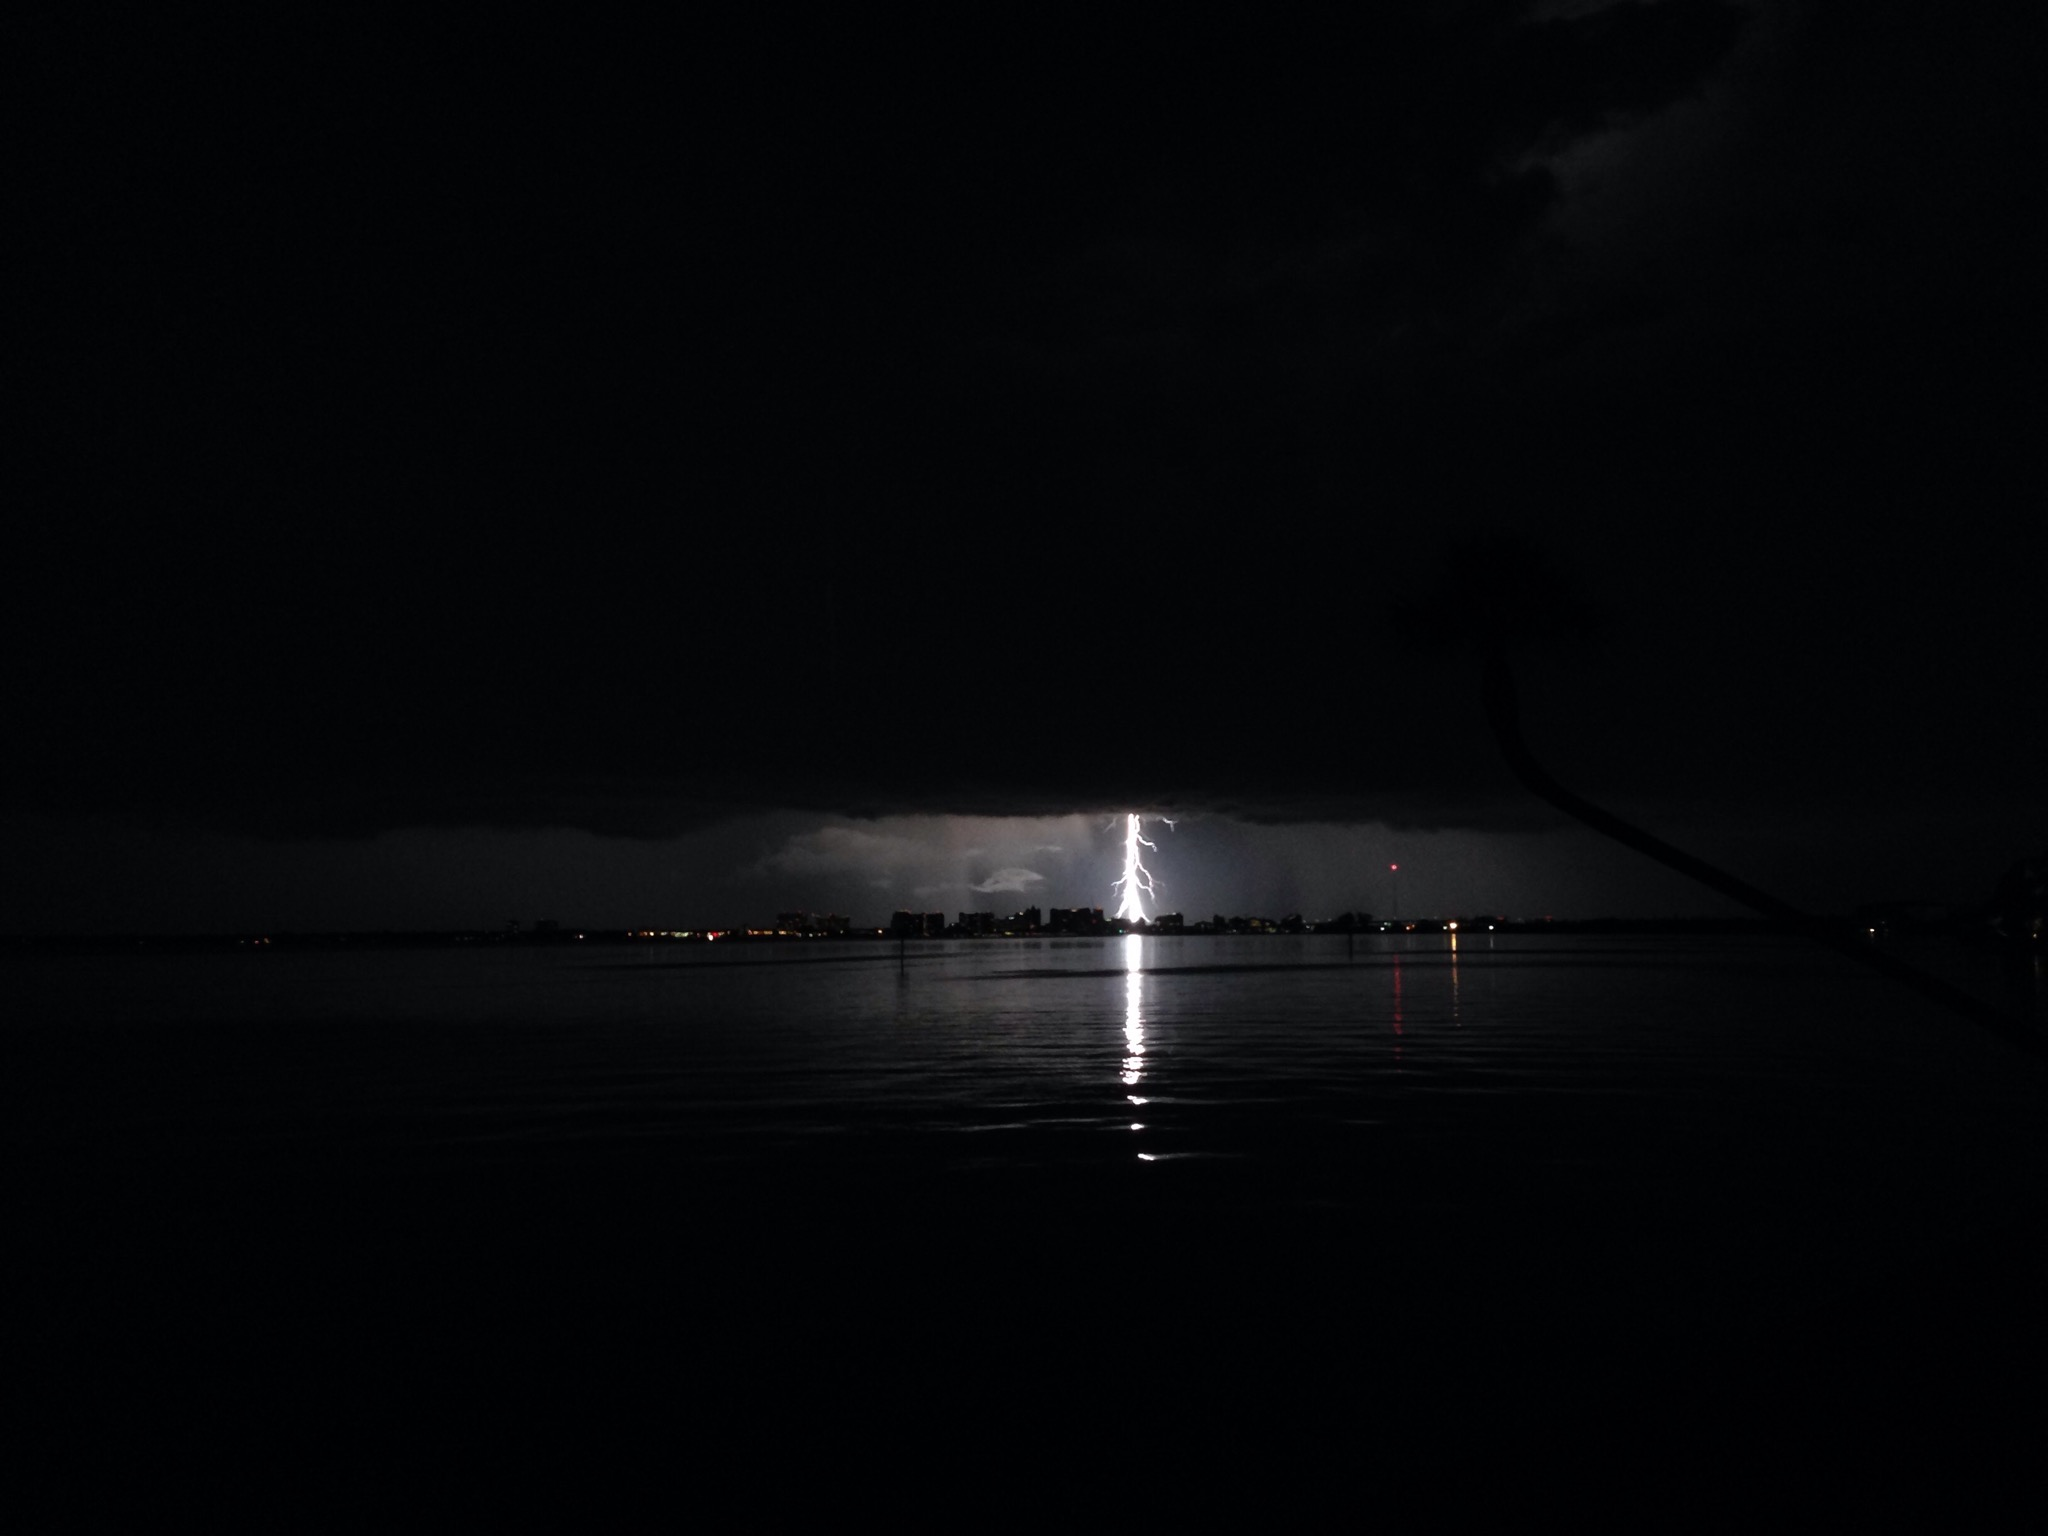 Lightning strike on Sarasota Bay